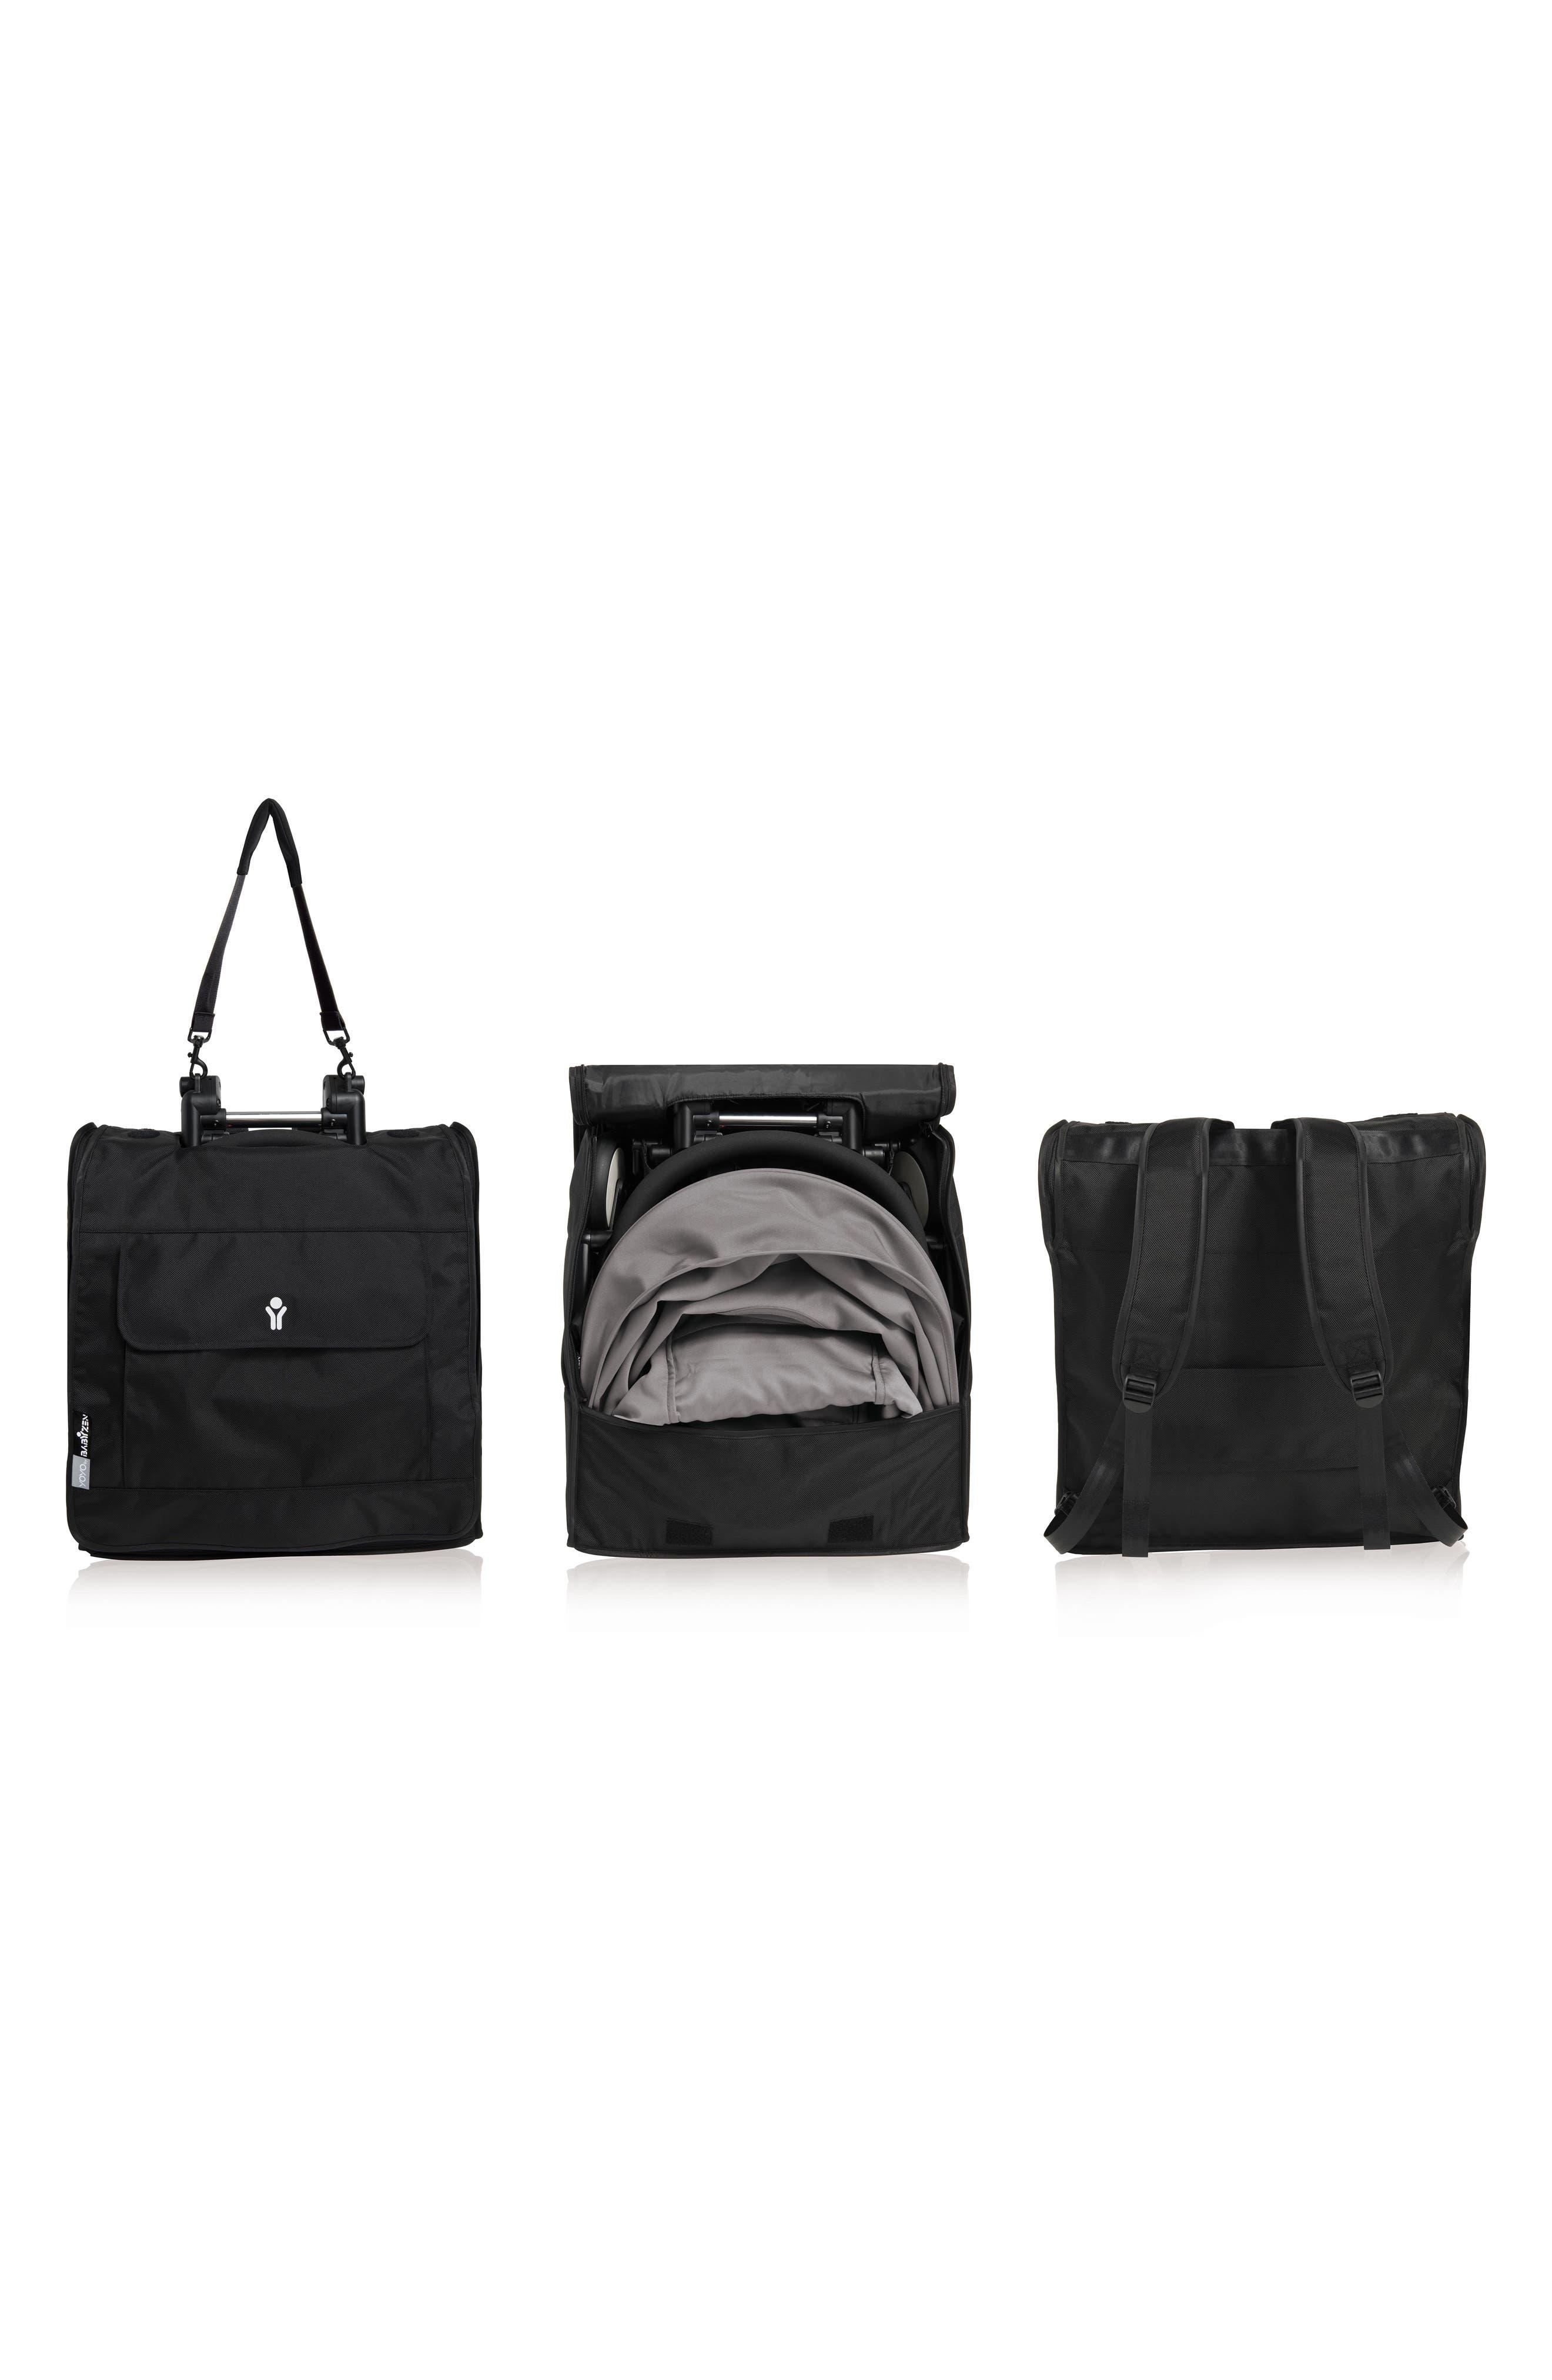 YOYO Stroller Travel Bag,                             Main thumbnail 1, color,                             BLACK